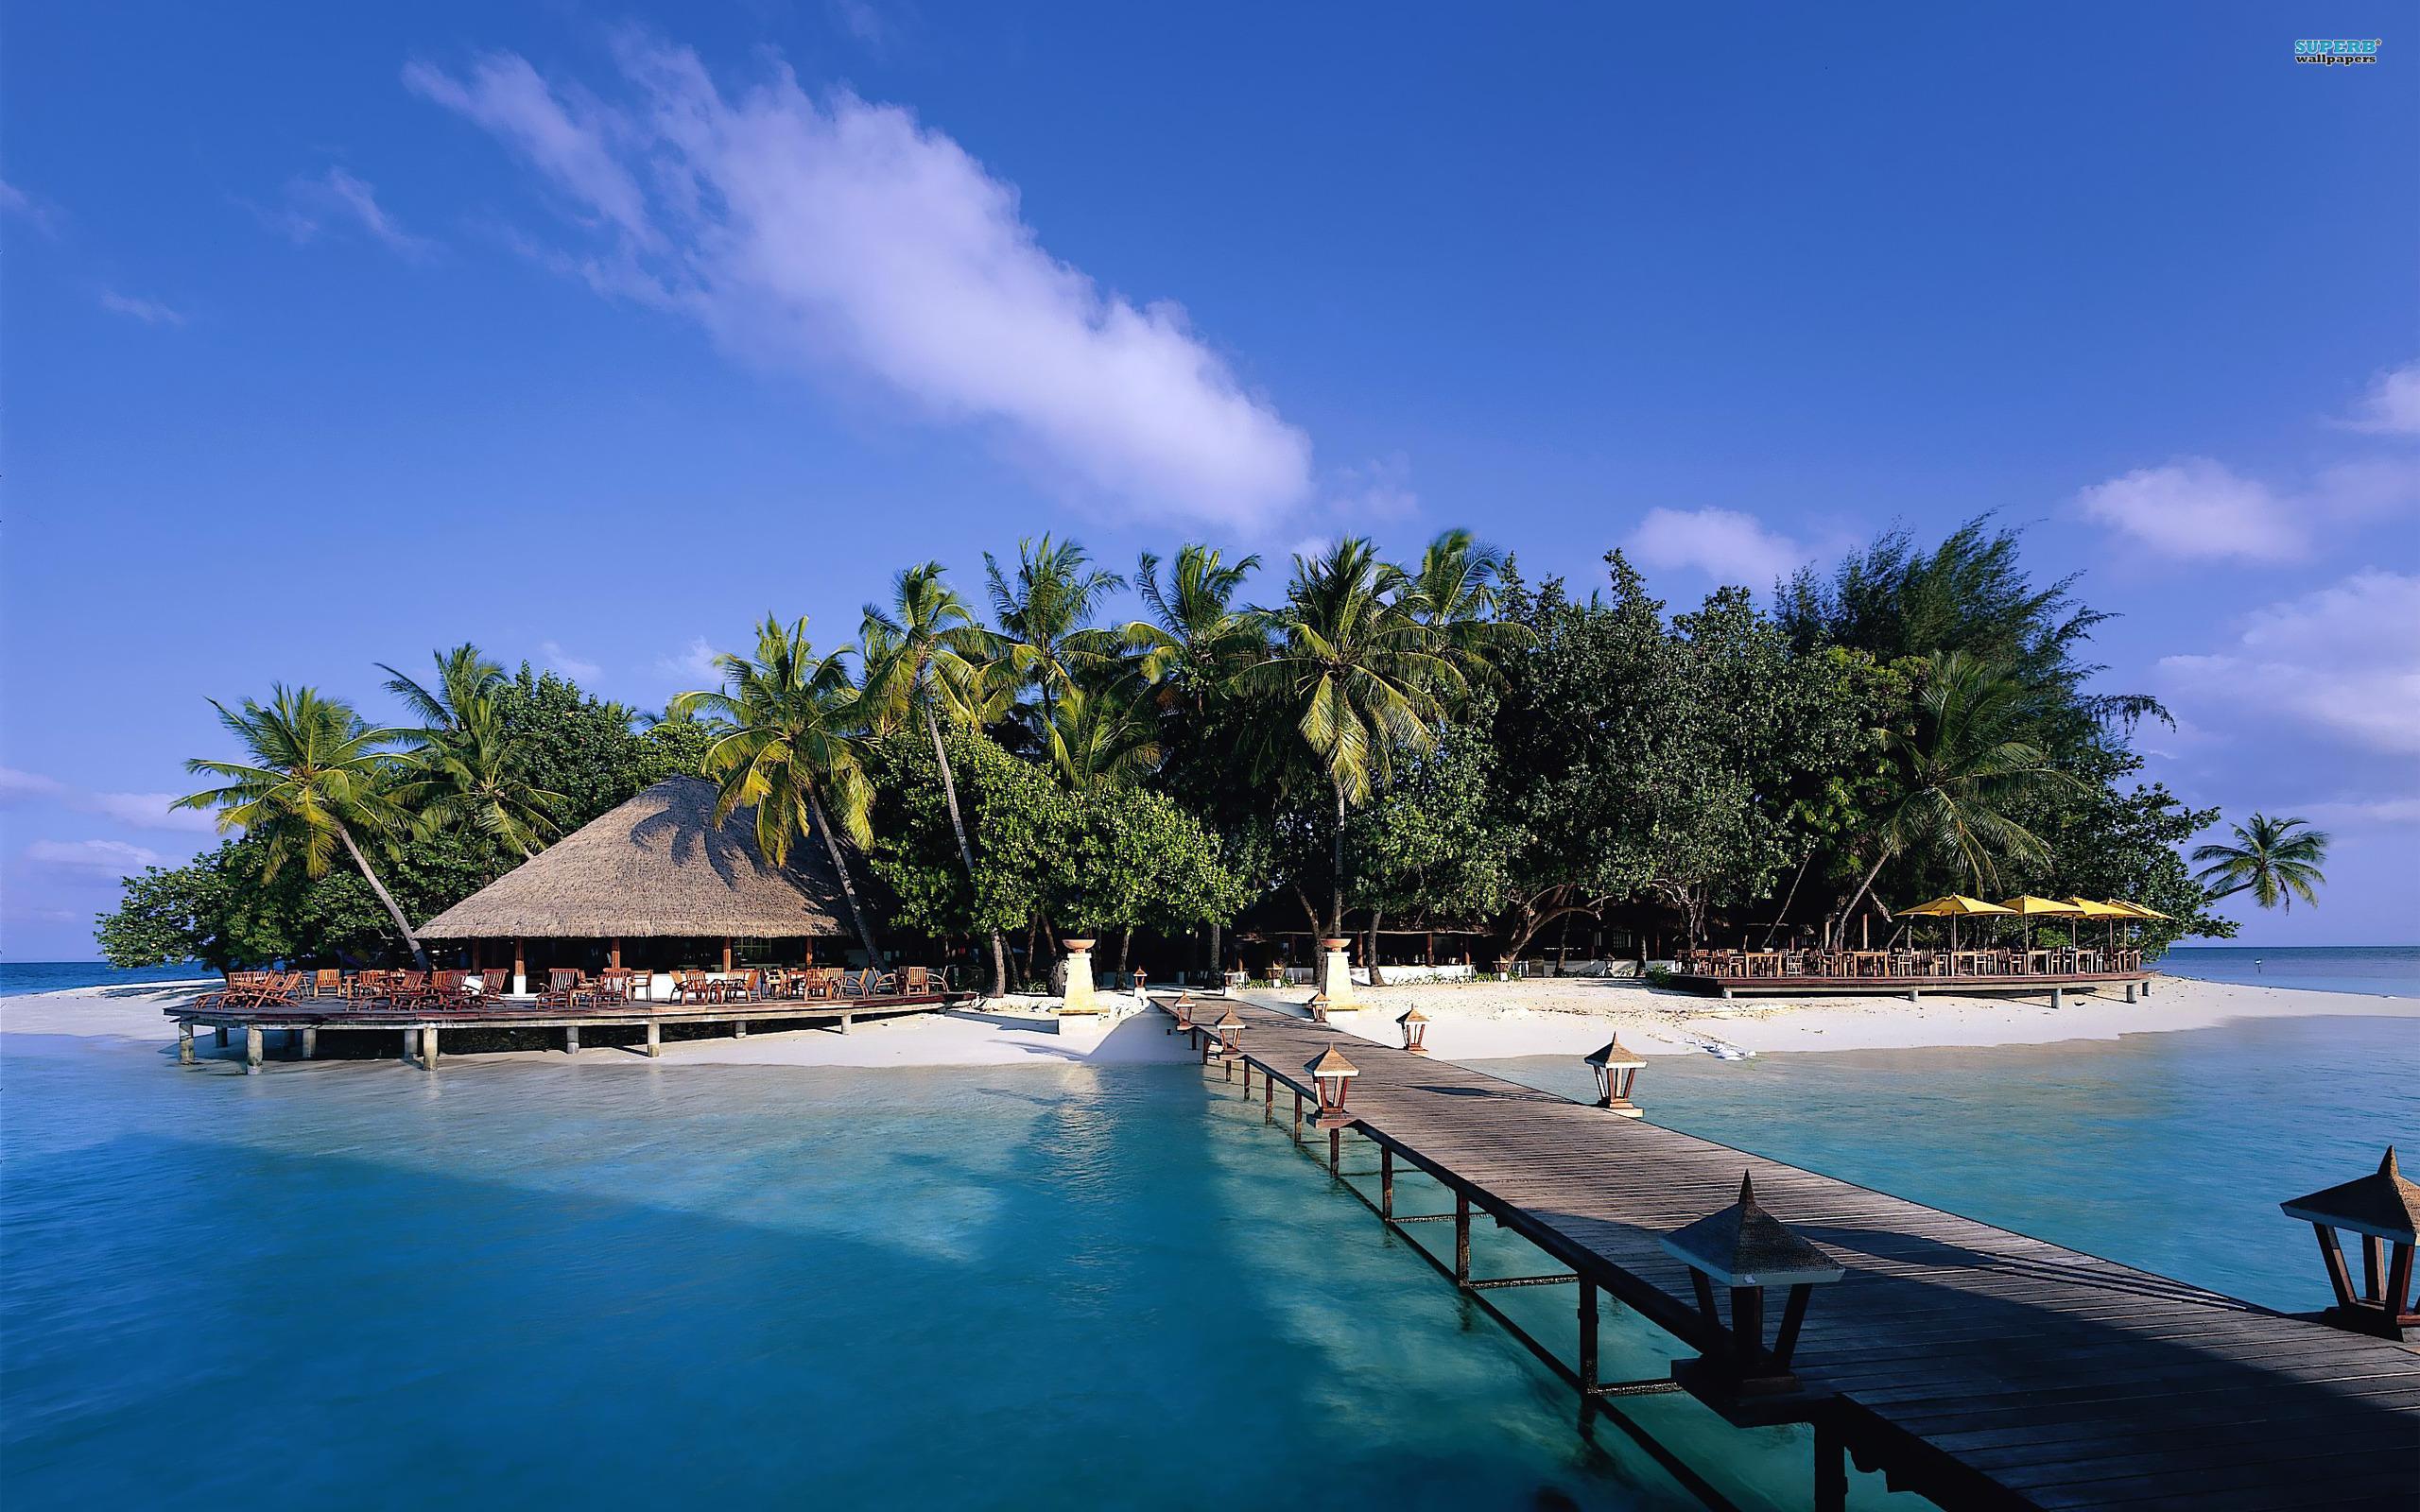 Maldives Beach 4K Wallpapers Desktop Backgrounds 2560x1600